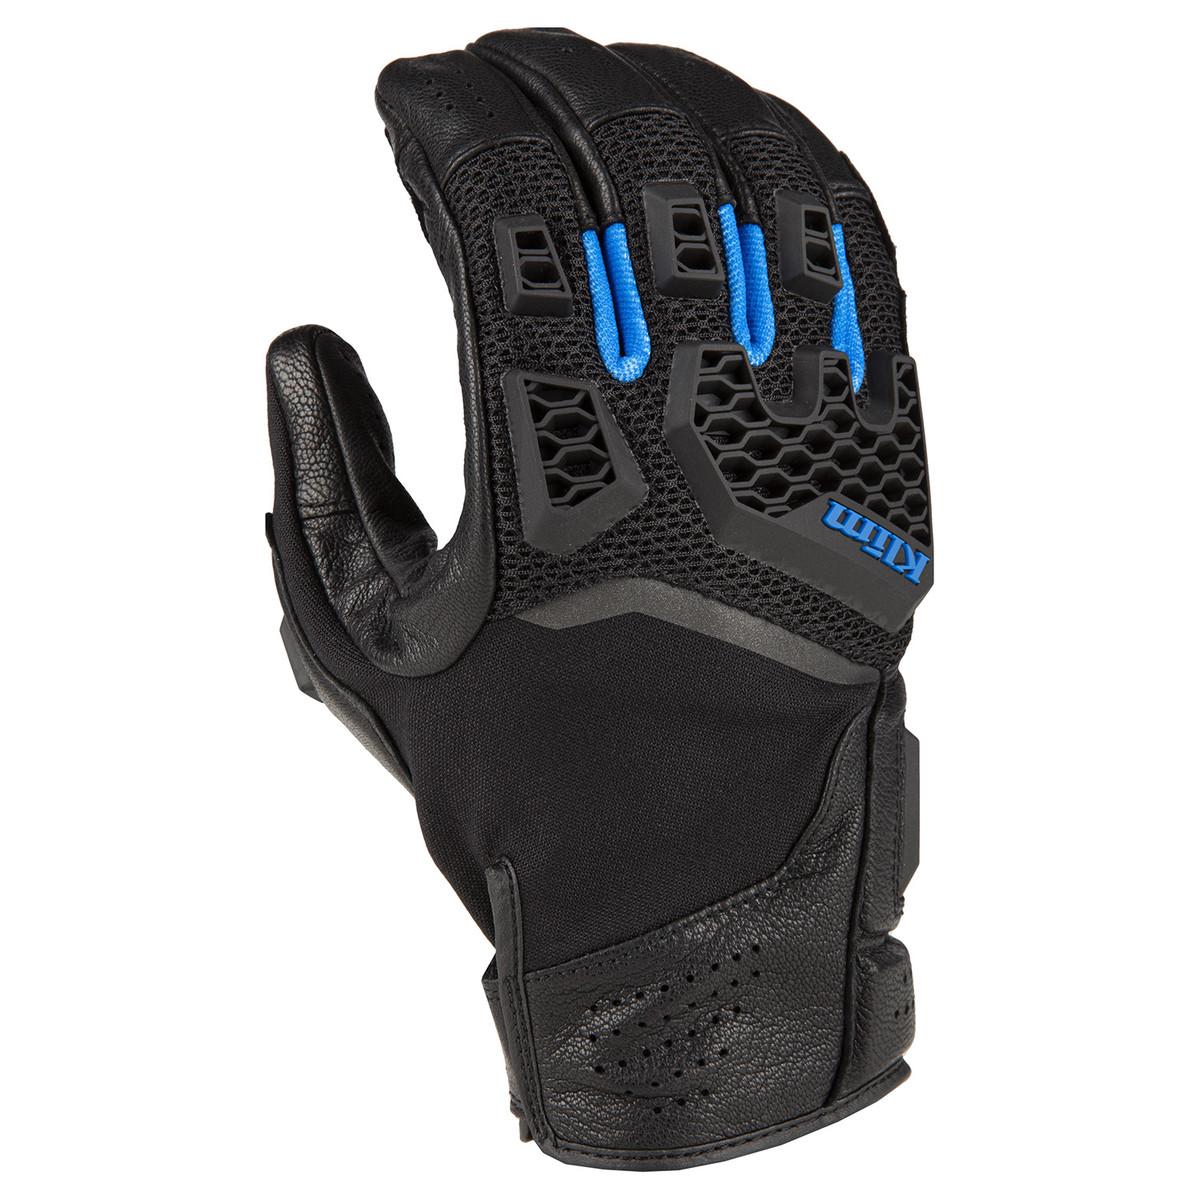 Klim Baja S4 Guantes Motorista Negro Kinetik Azul S